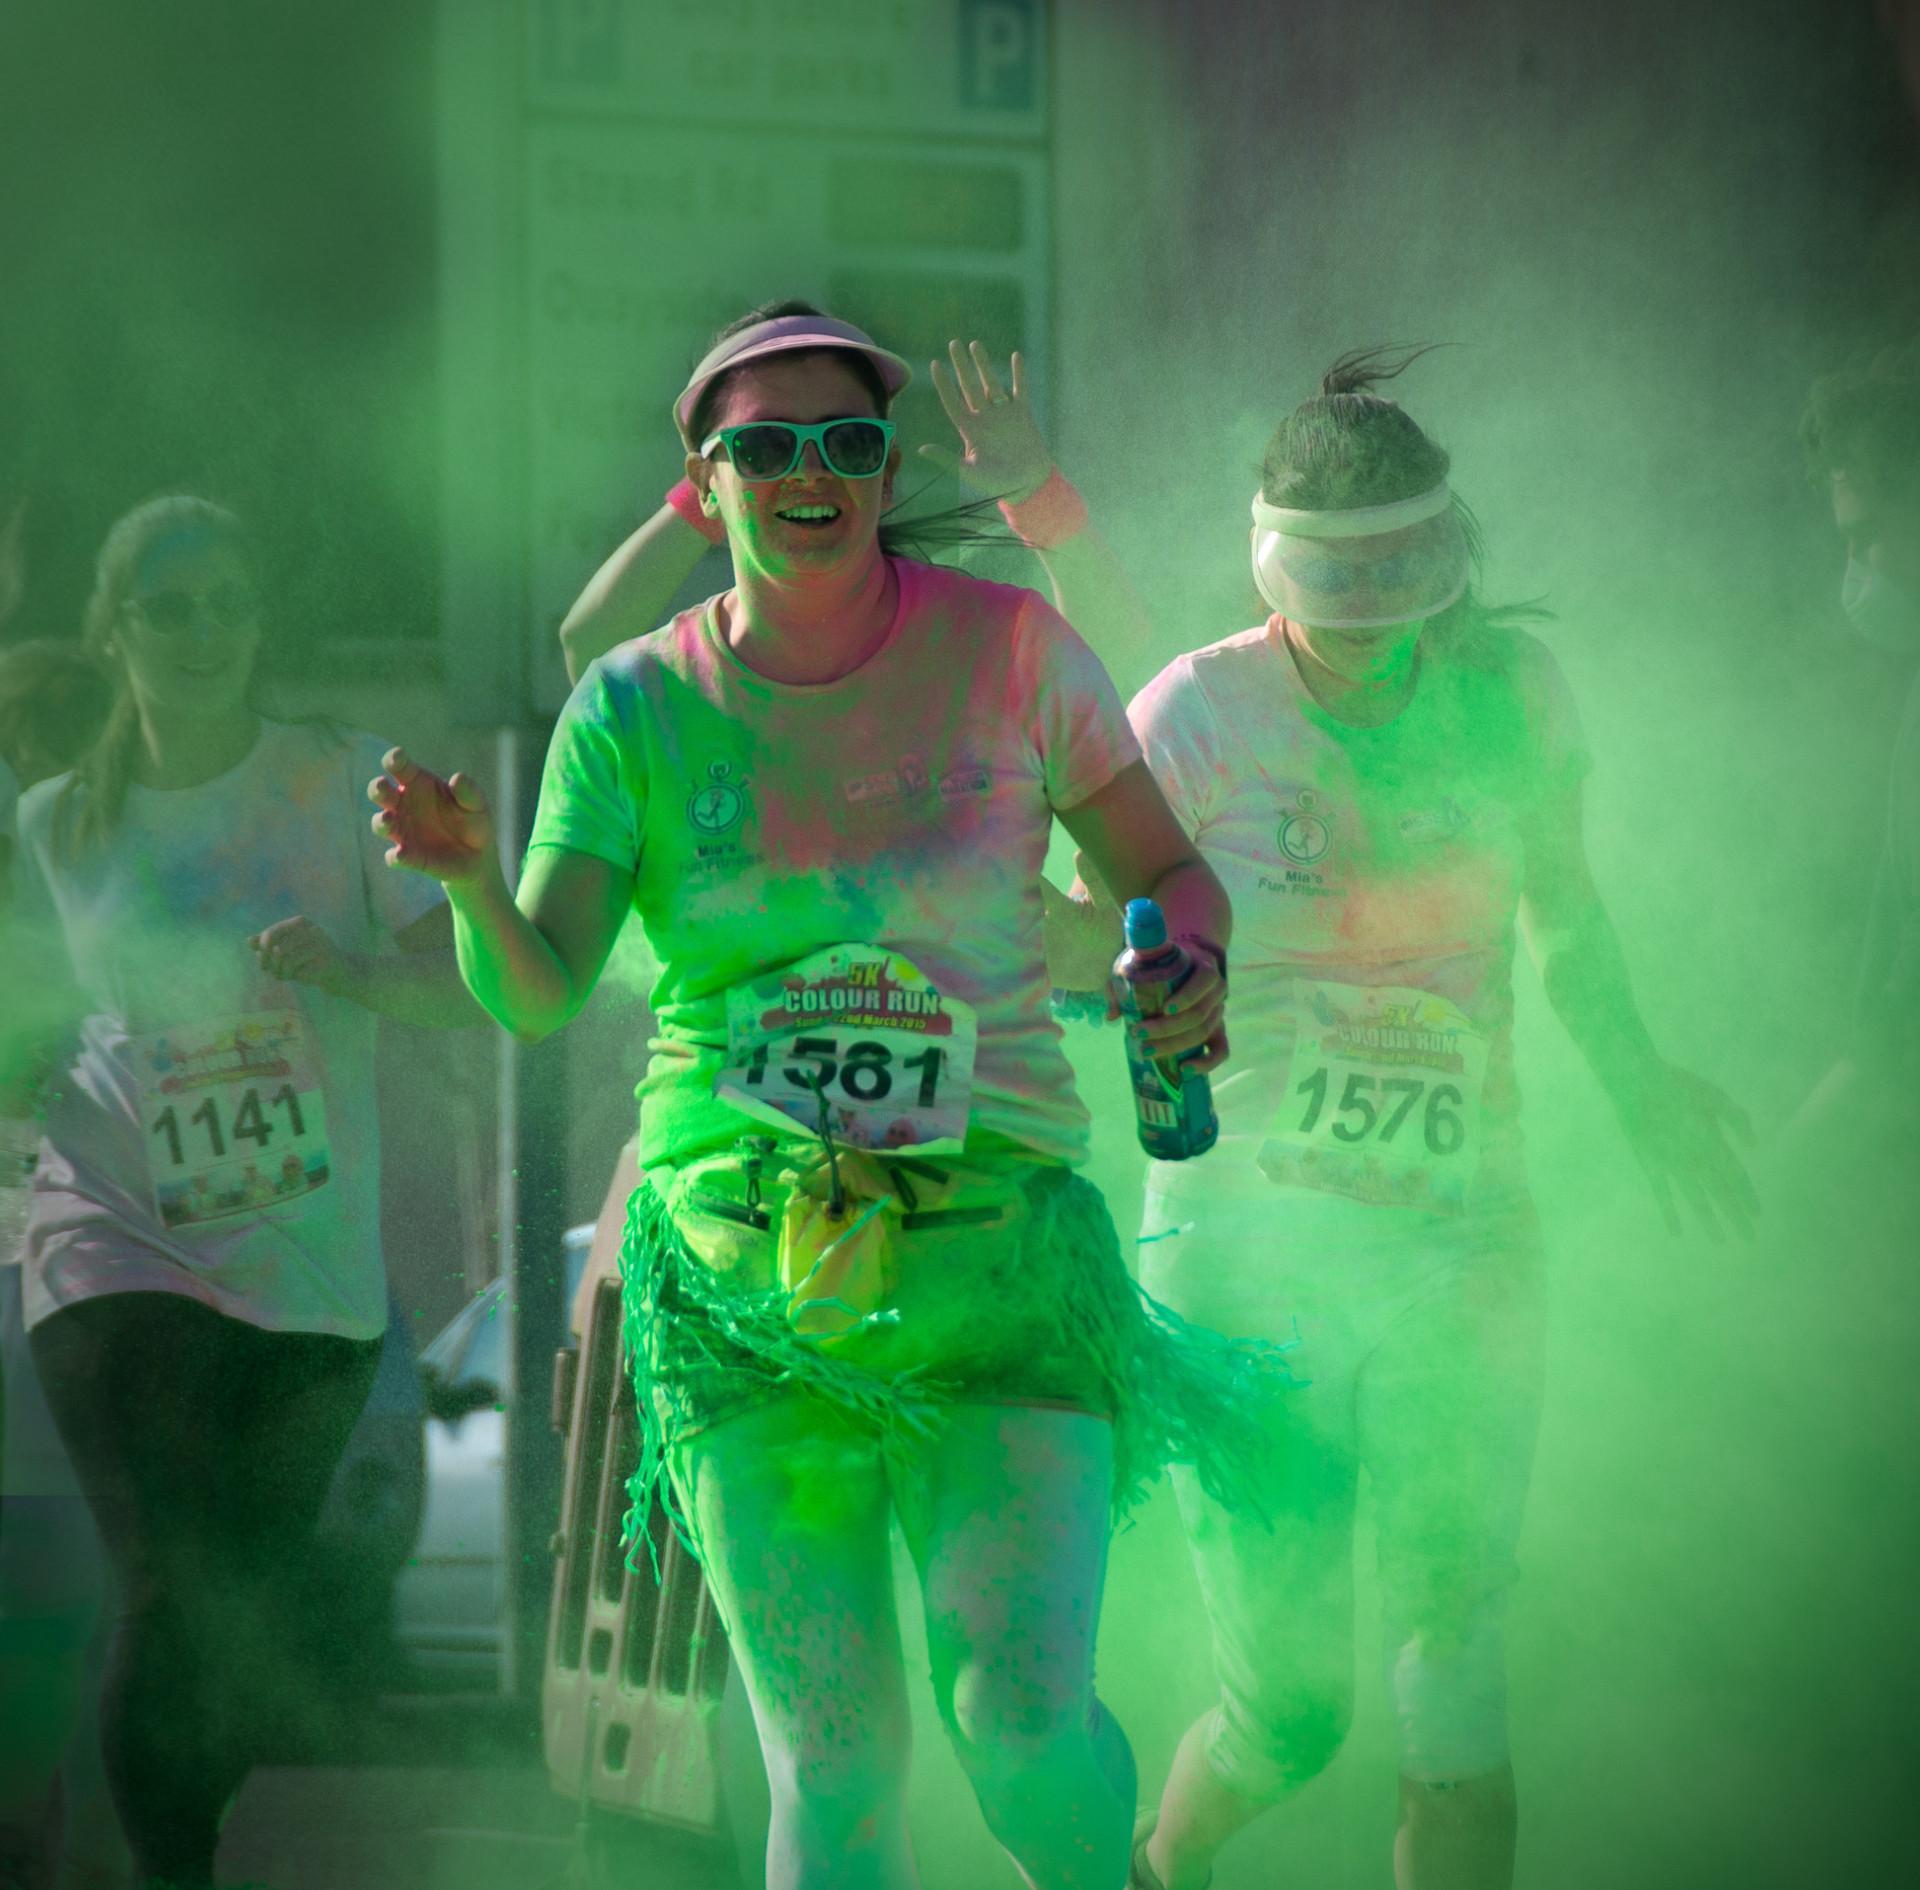 PDI - Fun Run by Eileen McCausland (10 marks)